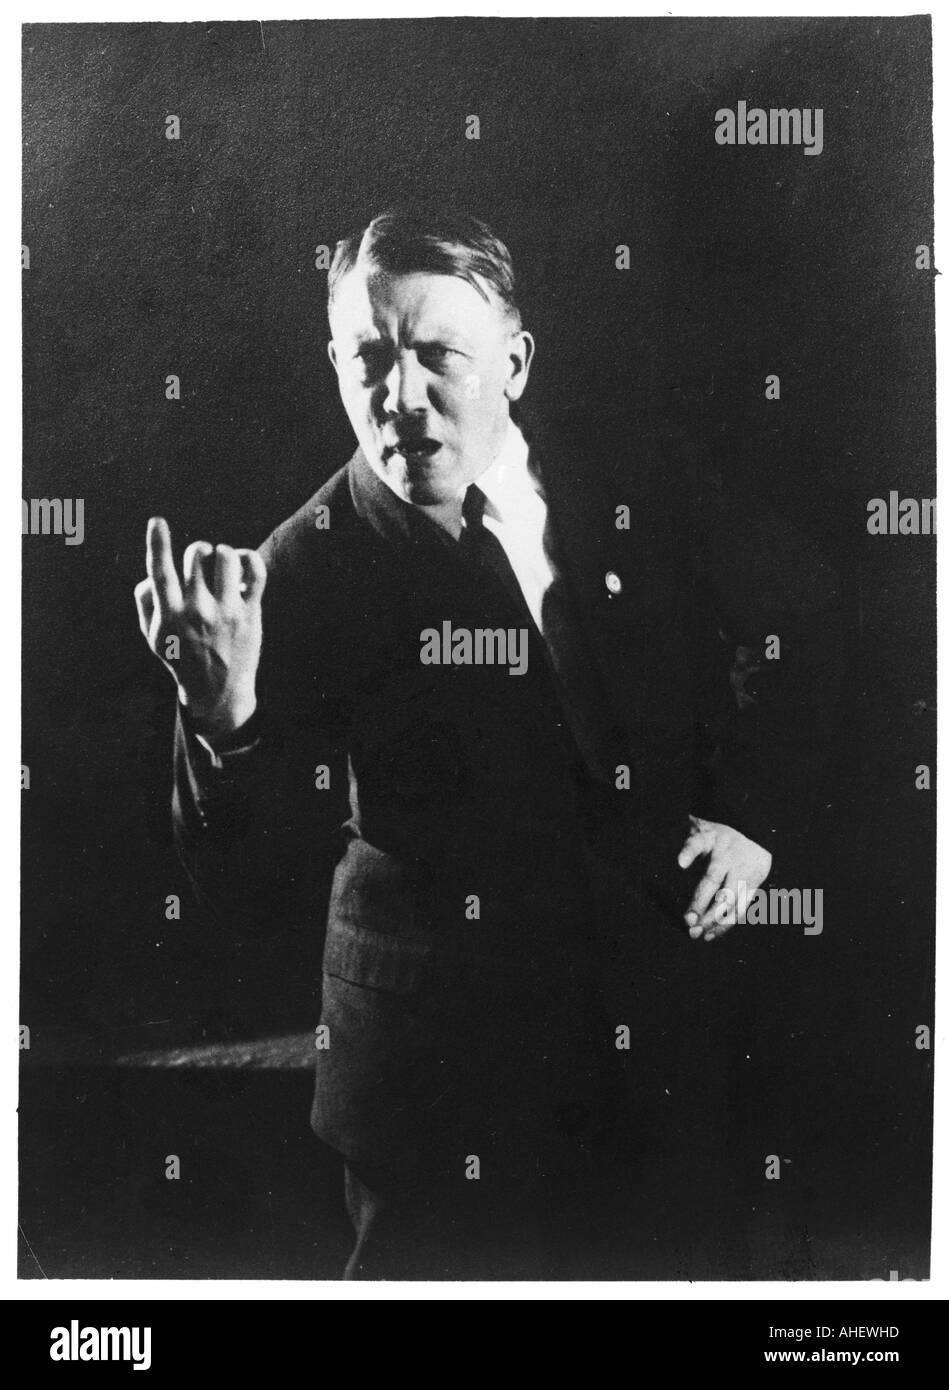 Hitler da el dedo Imagen De Stock